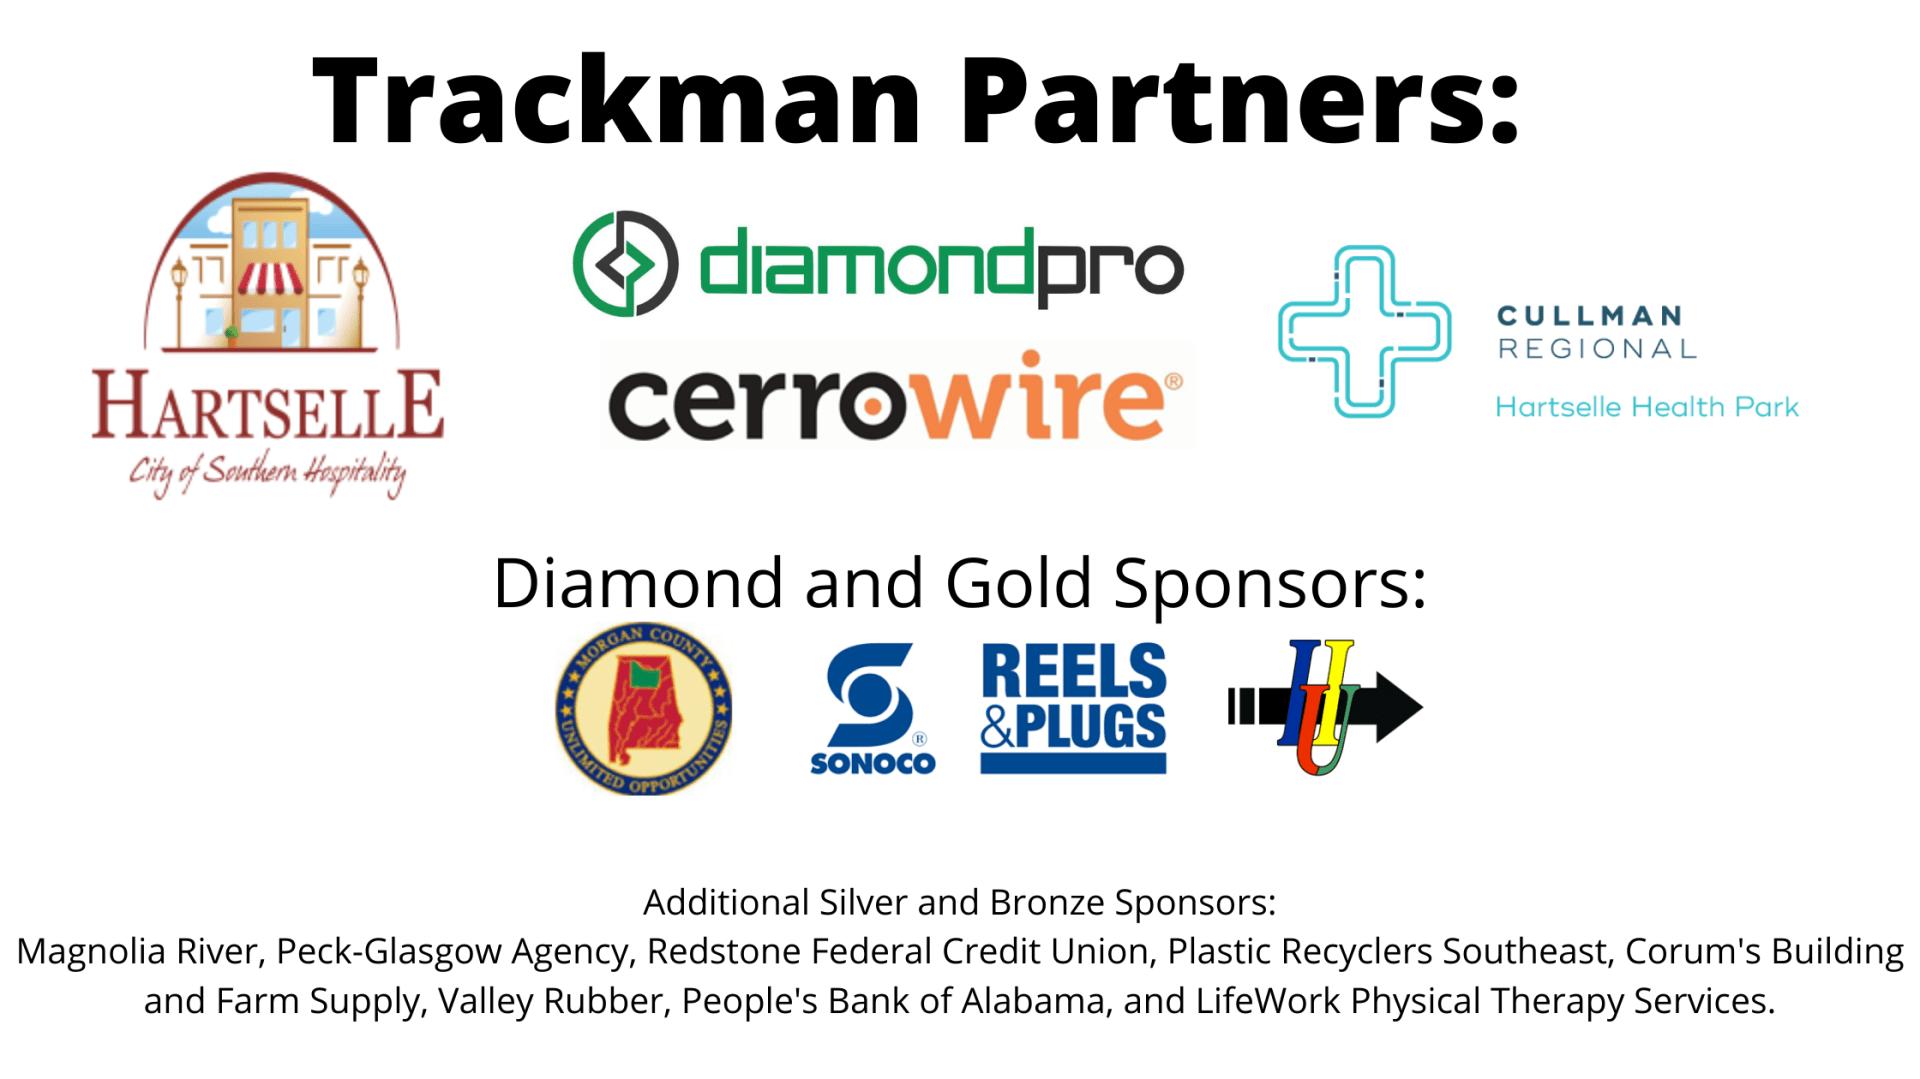 Trackman-Partners-banner-for-website-w1920.jpg